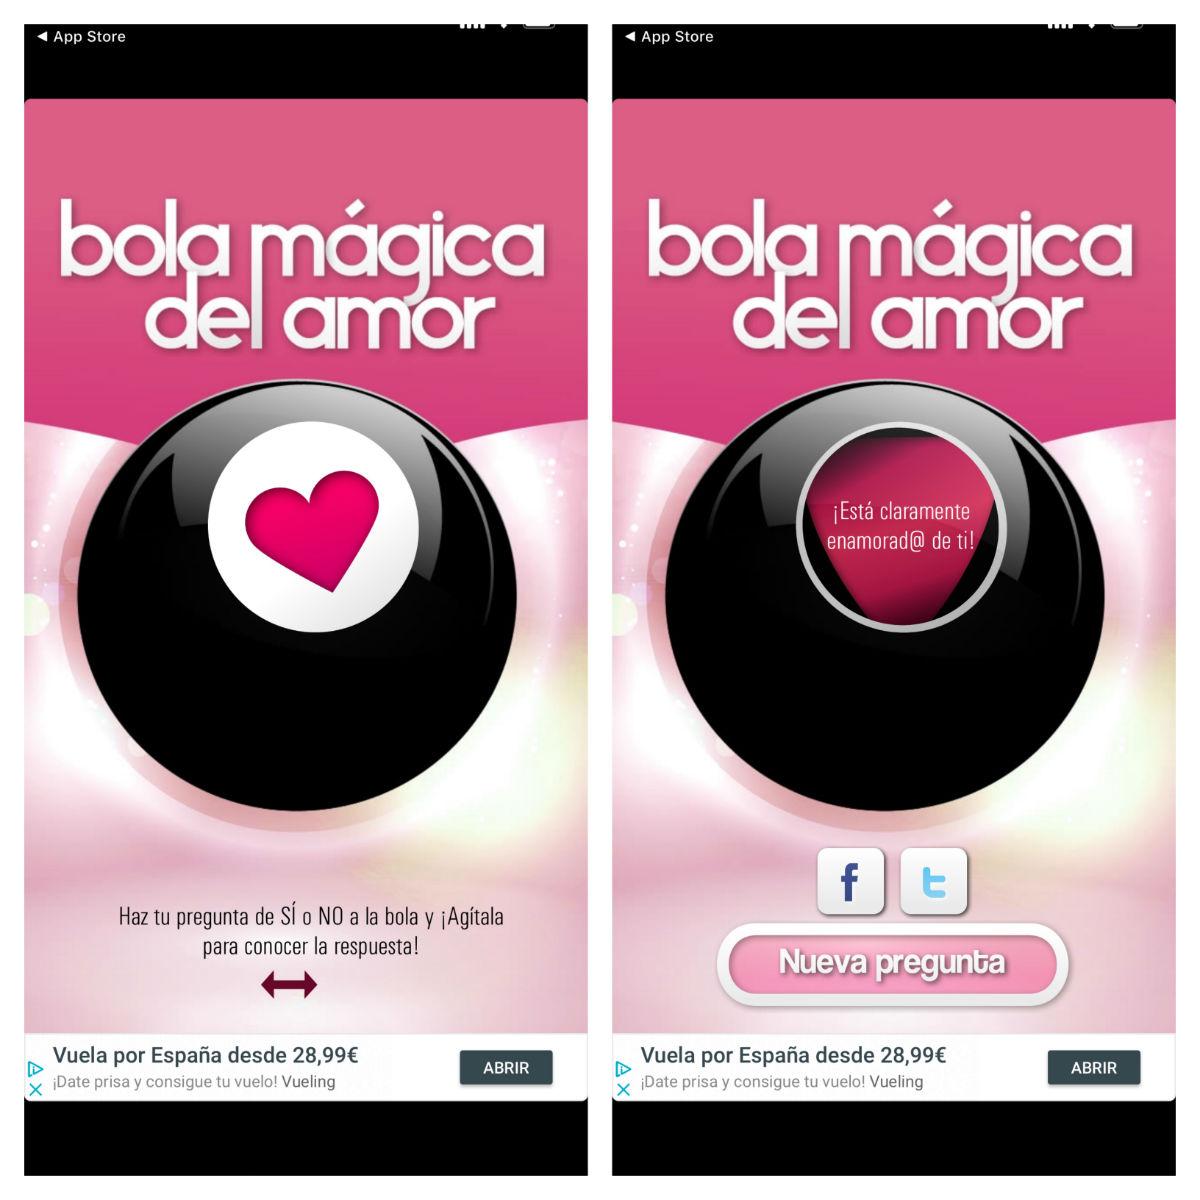 bola magica del amor